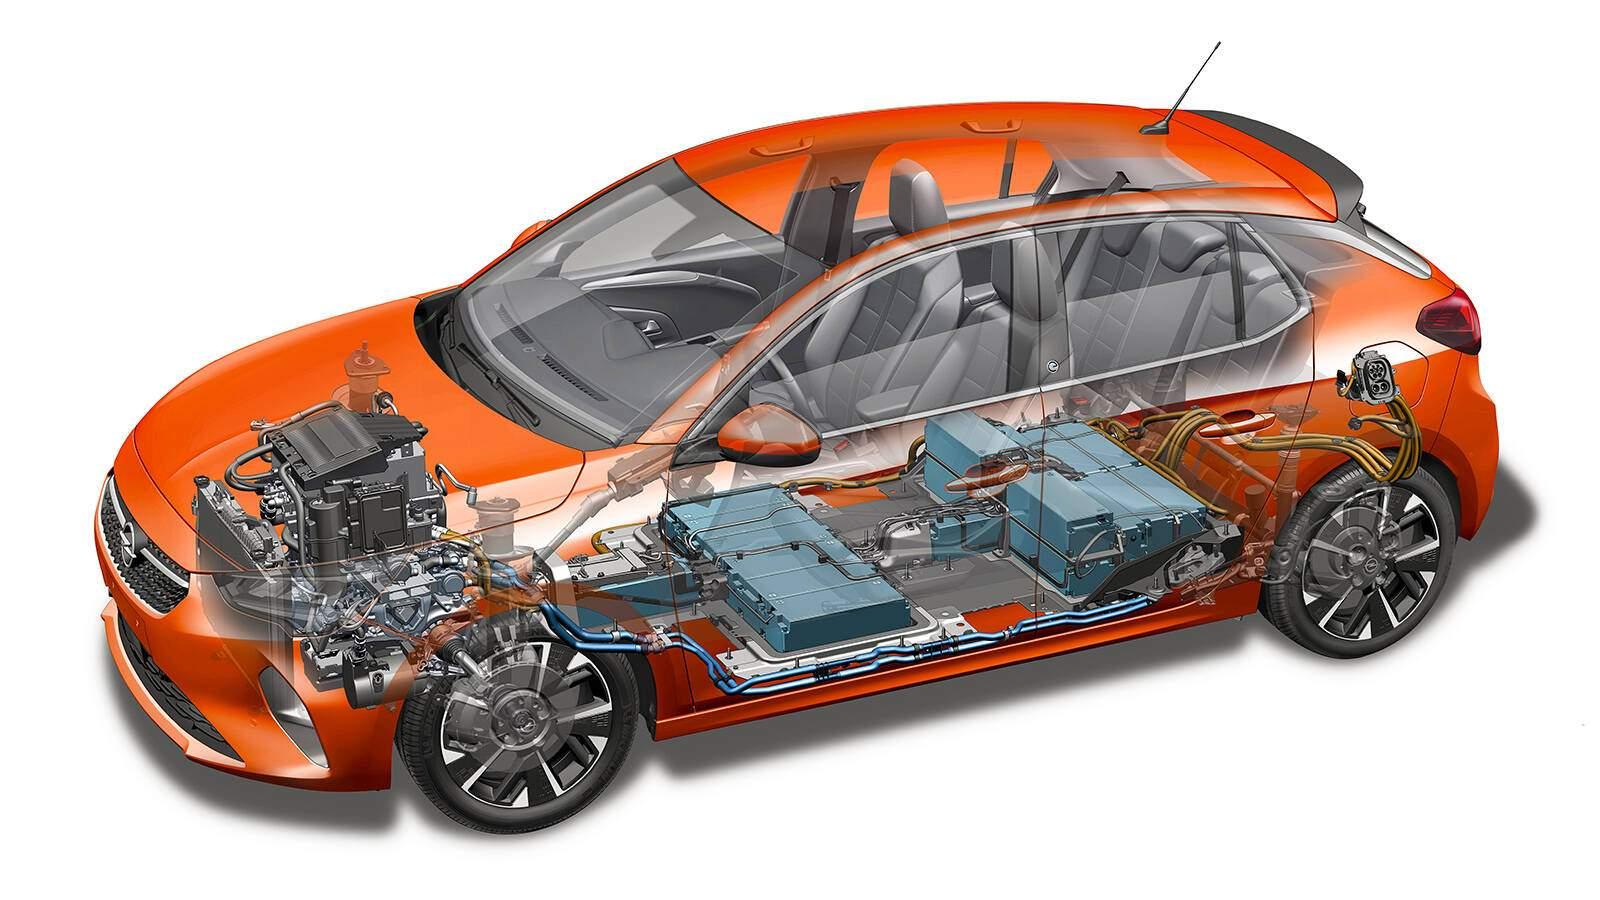 Opel Corsa VI e (F) (2019),  ajouté par fox58